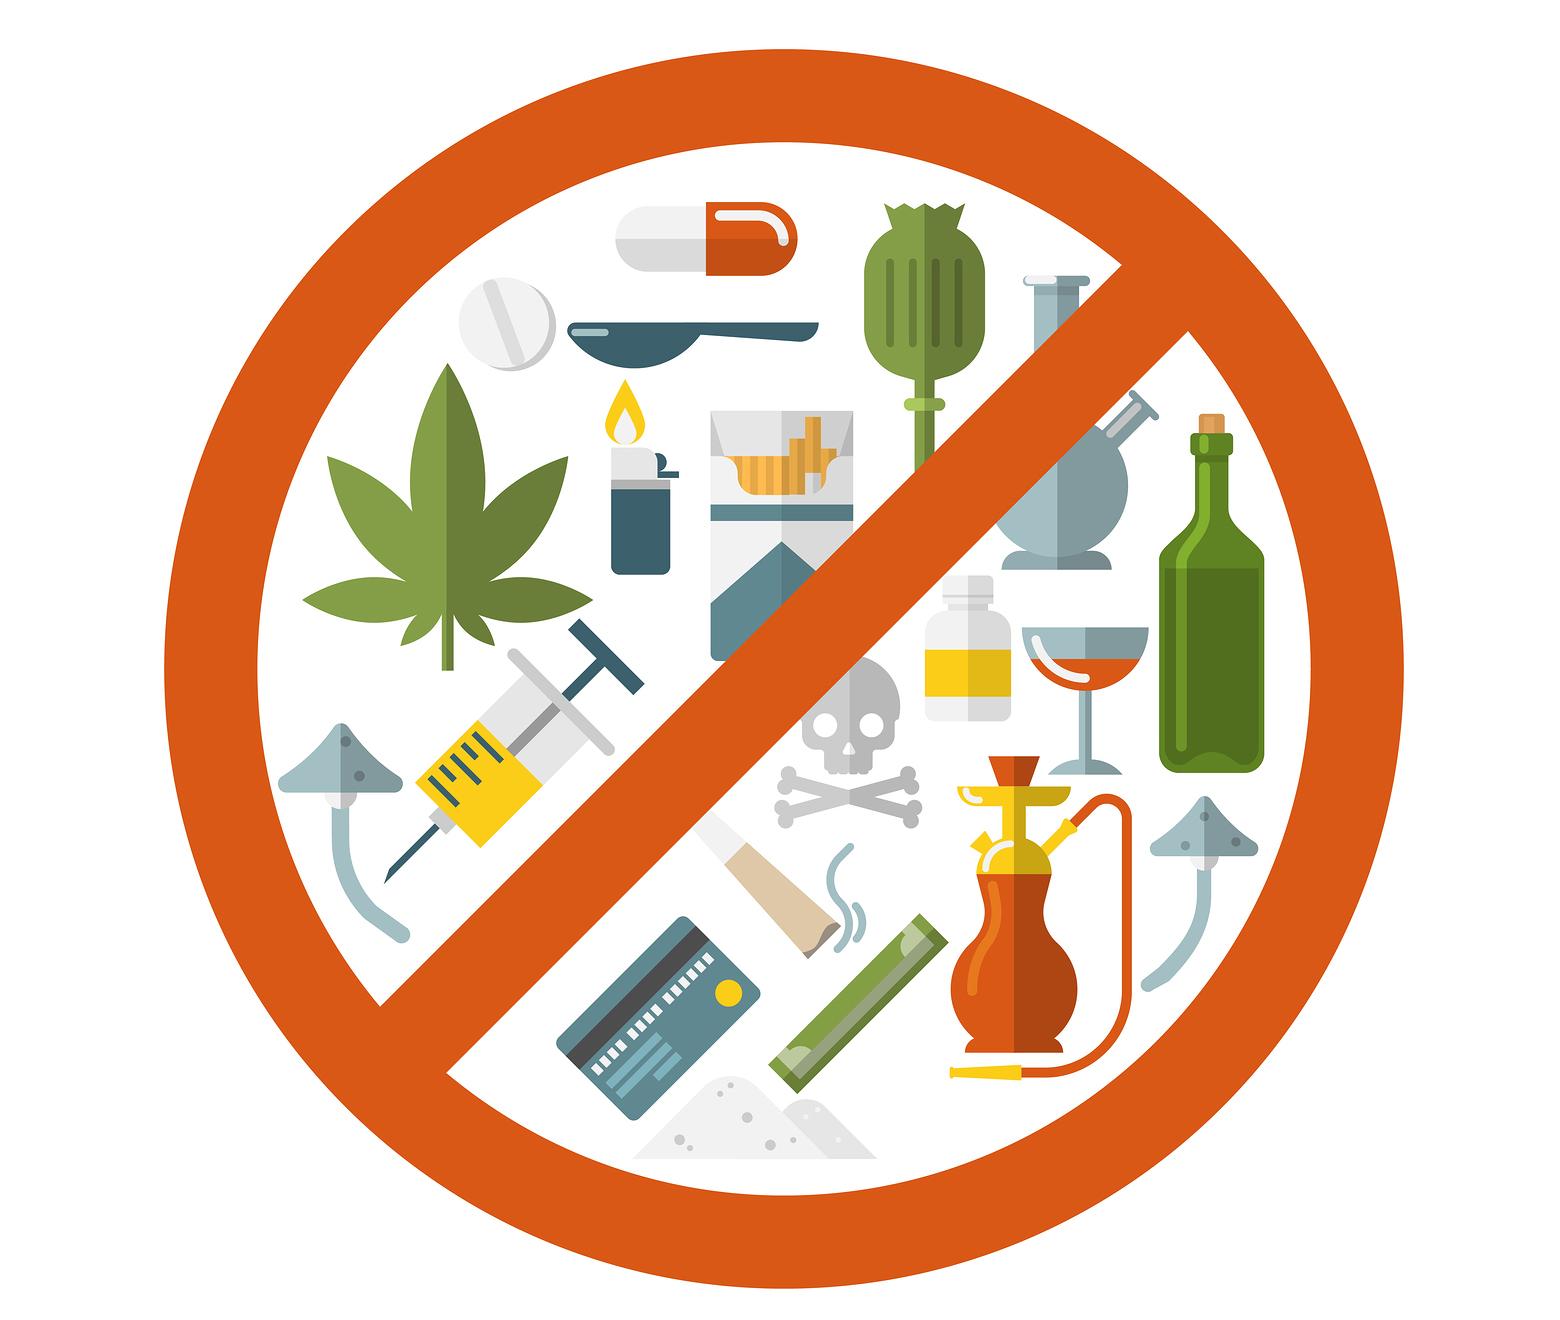 Drug clipart drug awareness. Free cliparts download clip